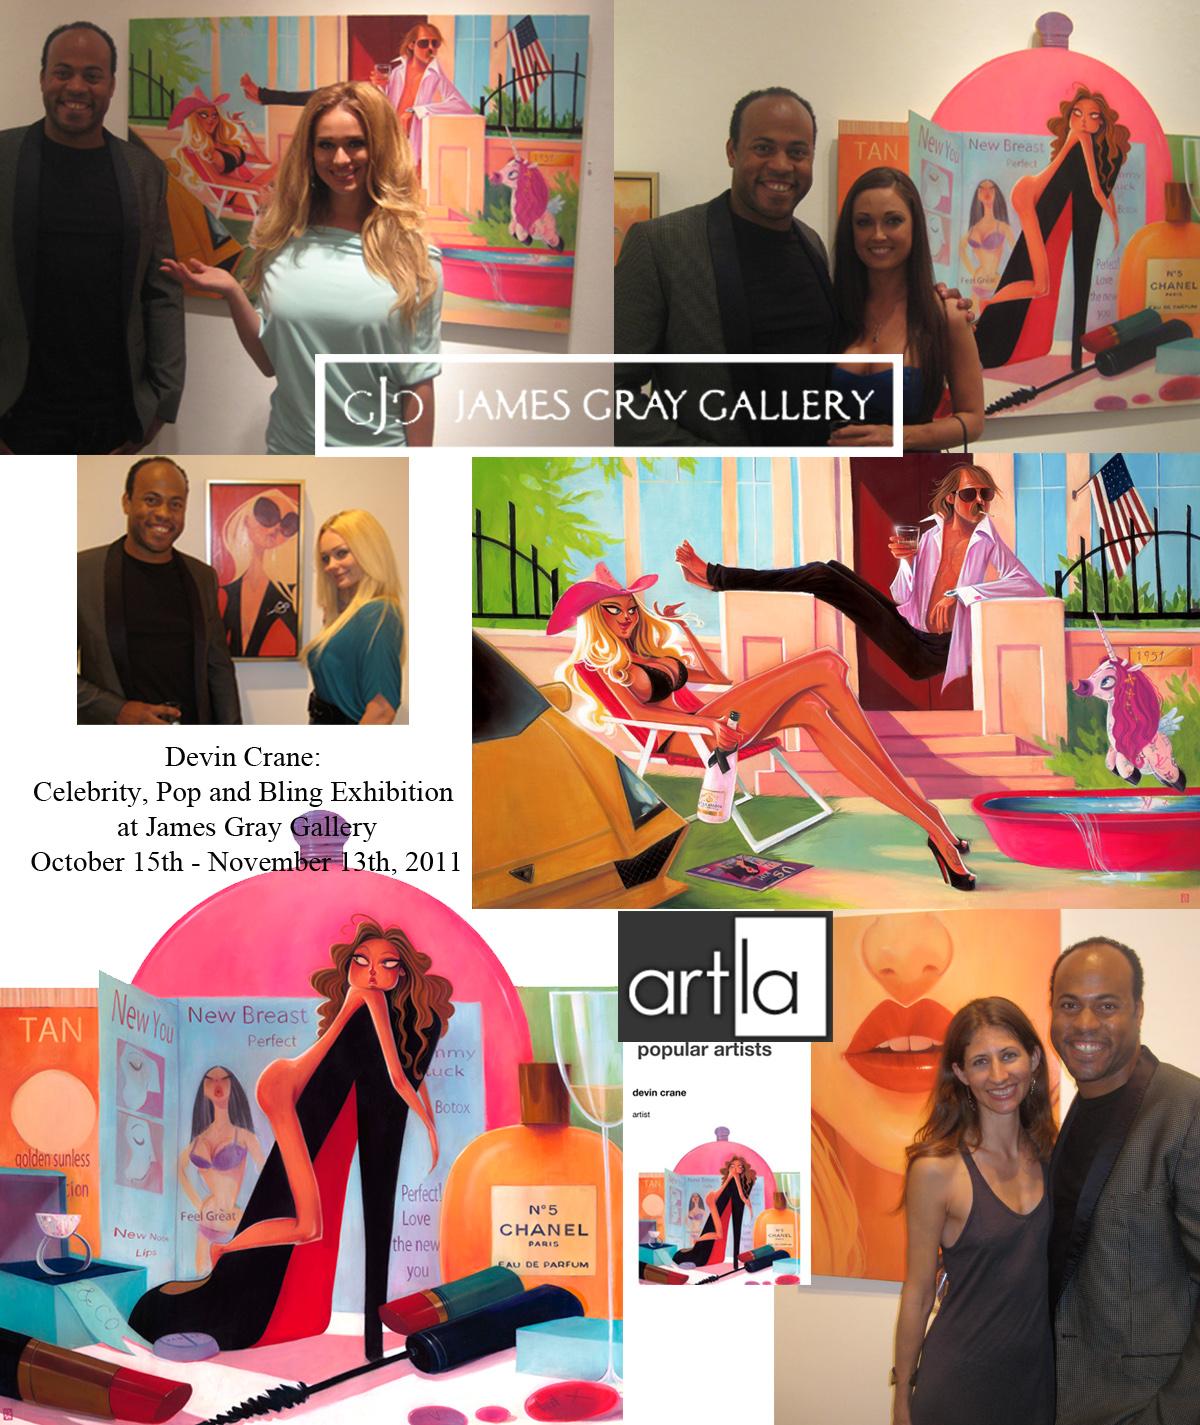 James Gray Gallery Press -